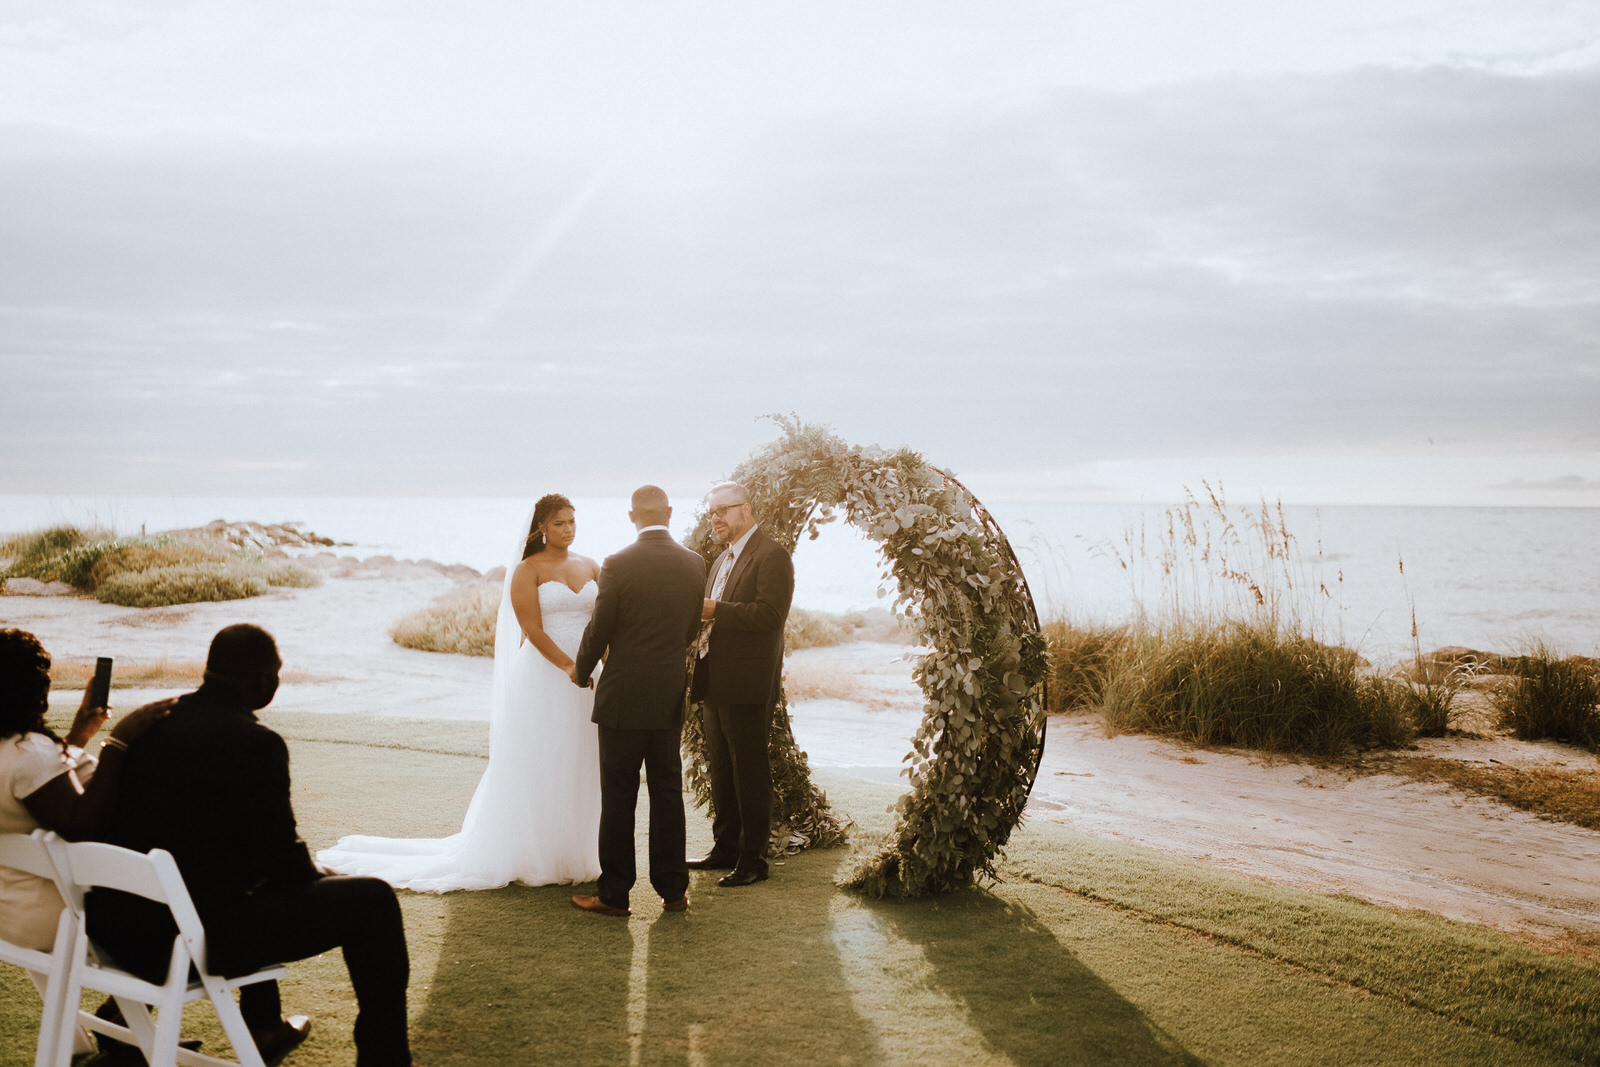 South Seas Island Resort Elopement- Alyana and Shawn- Michelle Gonzalez Photography-457.JPG